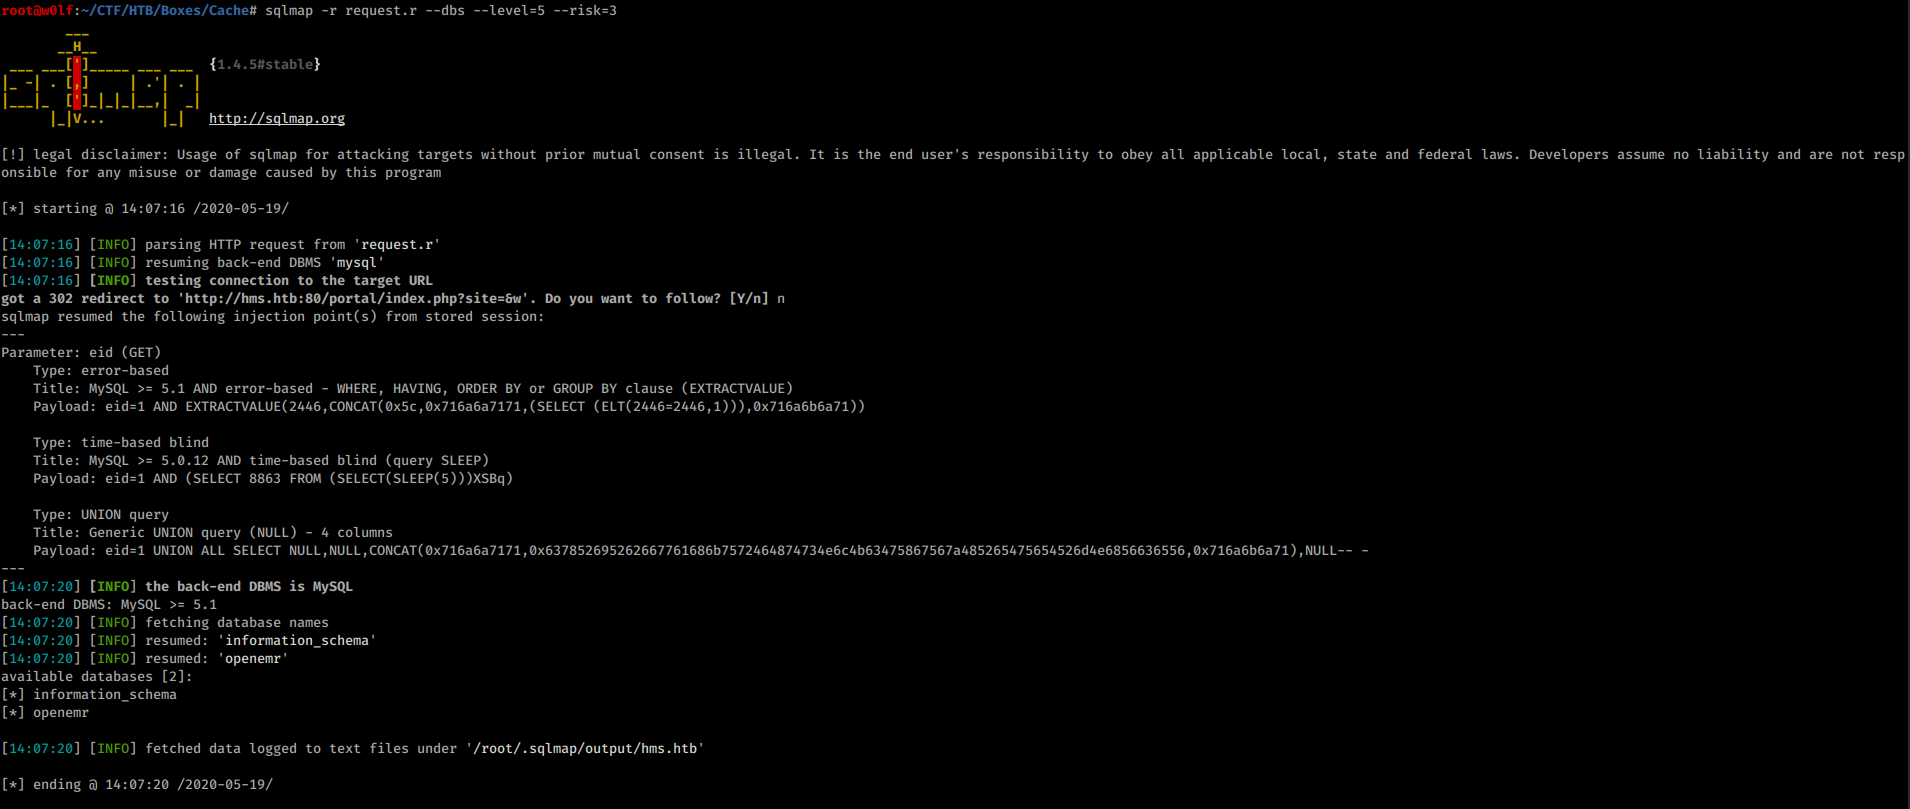 https://raw.githubusercontent.com/0xw0lf/0xw0lf.github.io/master/img/htb-cache/Untitled%2013.png